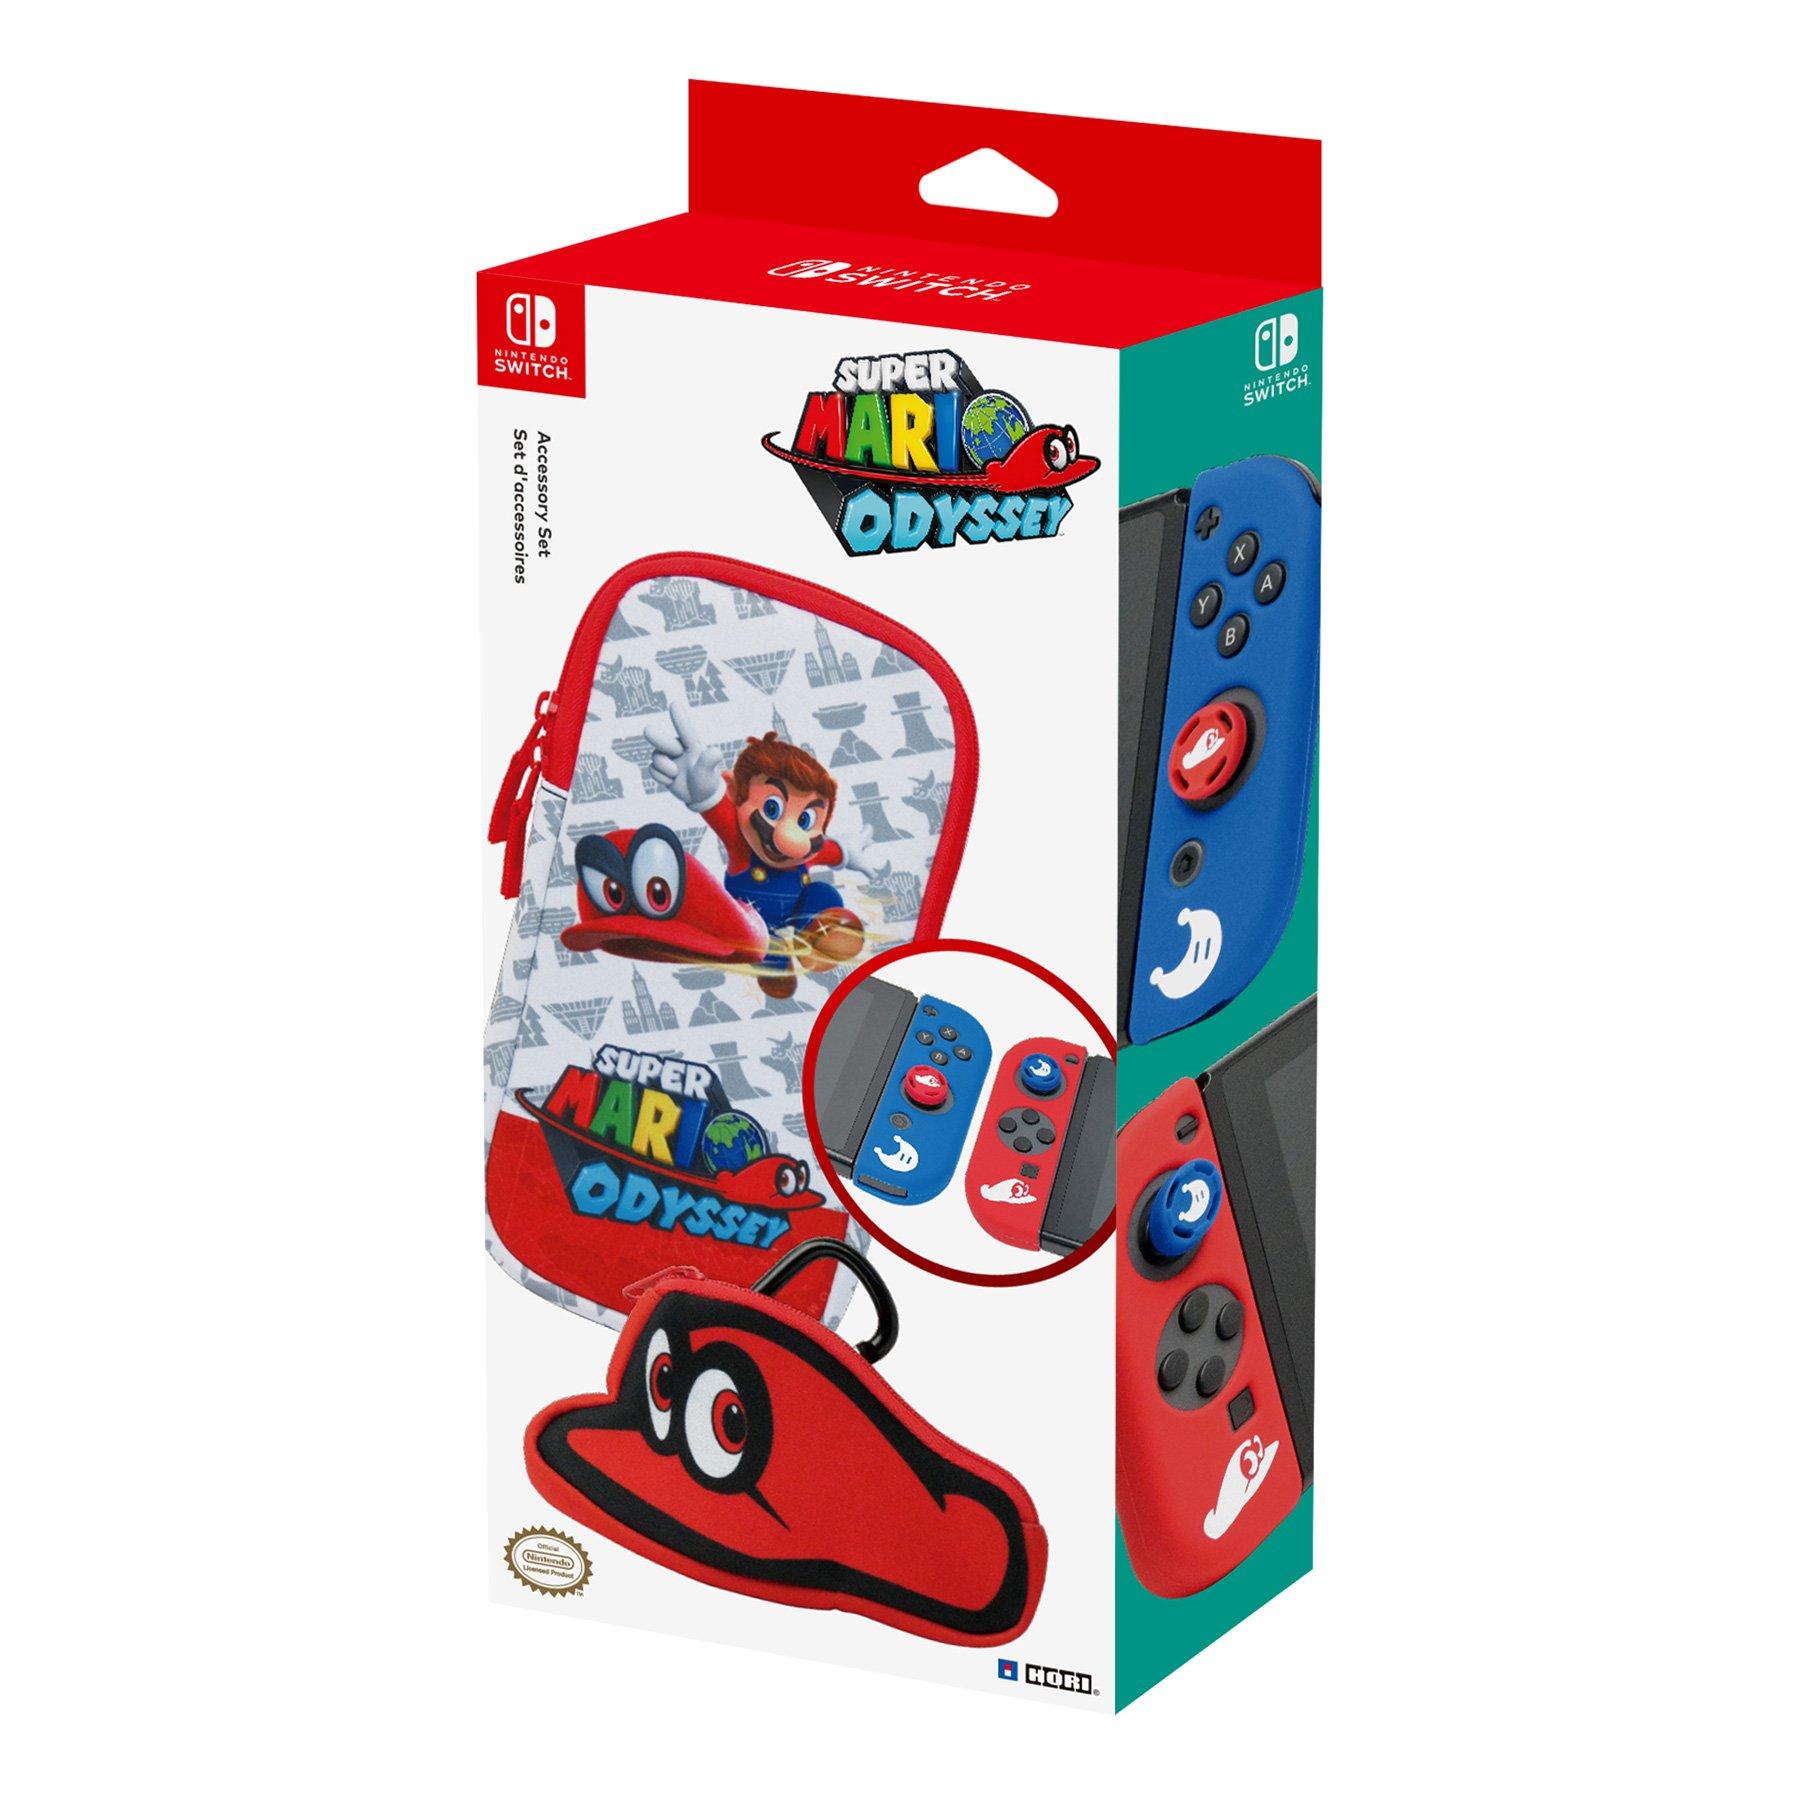 aecf28b6869a7 Amazon.com  HORI Super Mario Odyssey Accessory Set Officially Licensed - Nintendo  Switch  Video Games